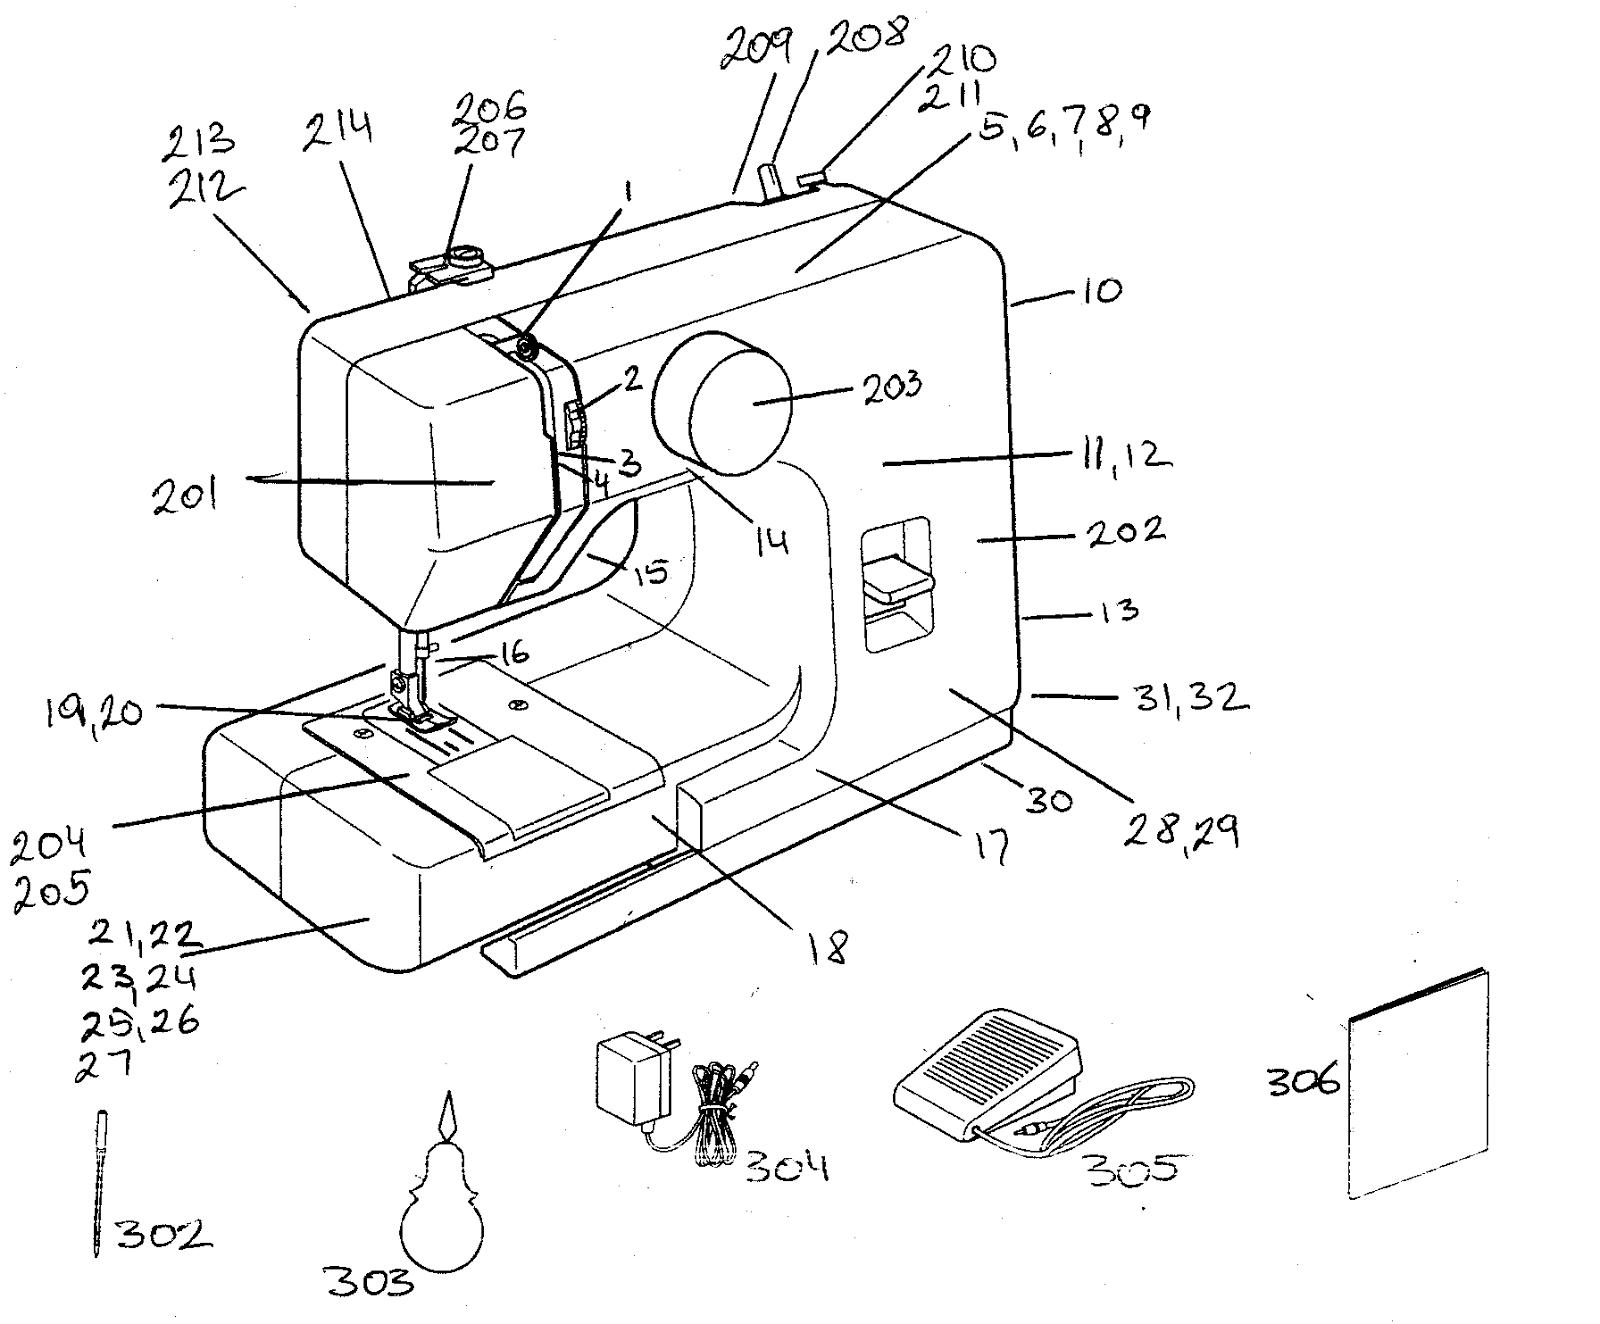 Basic Sewing Machine Parts Diagram